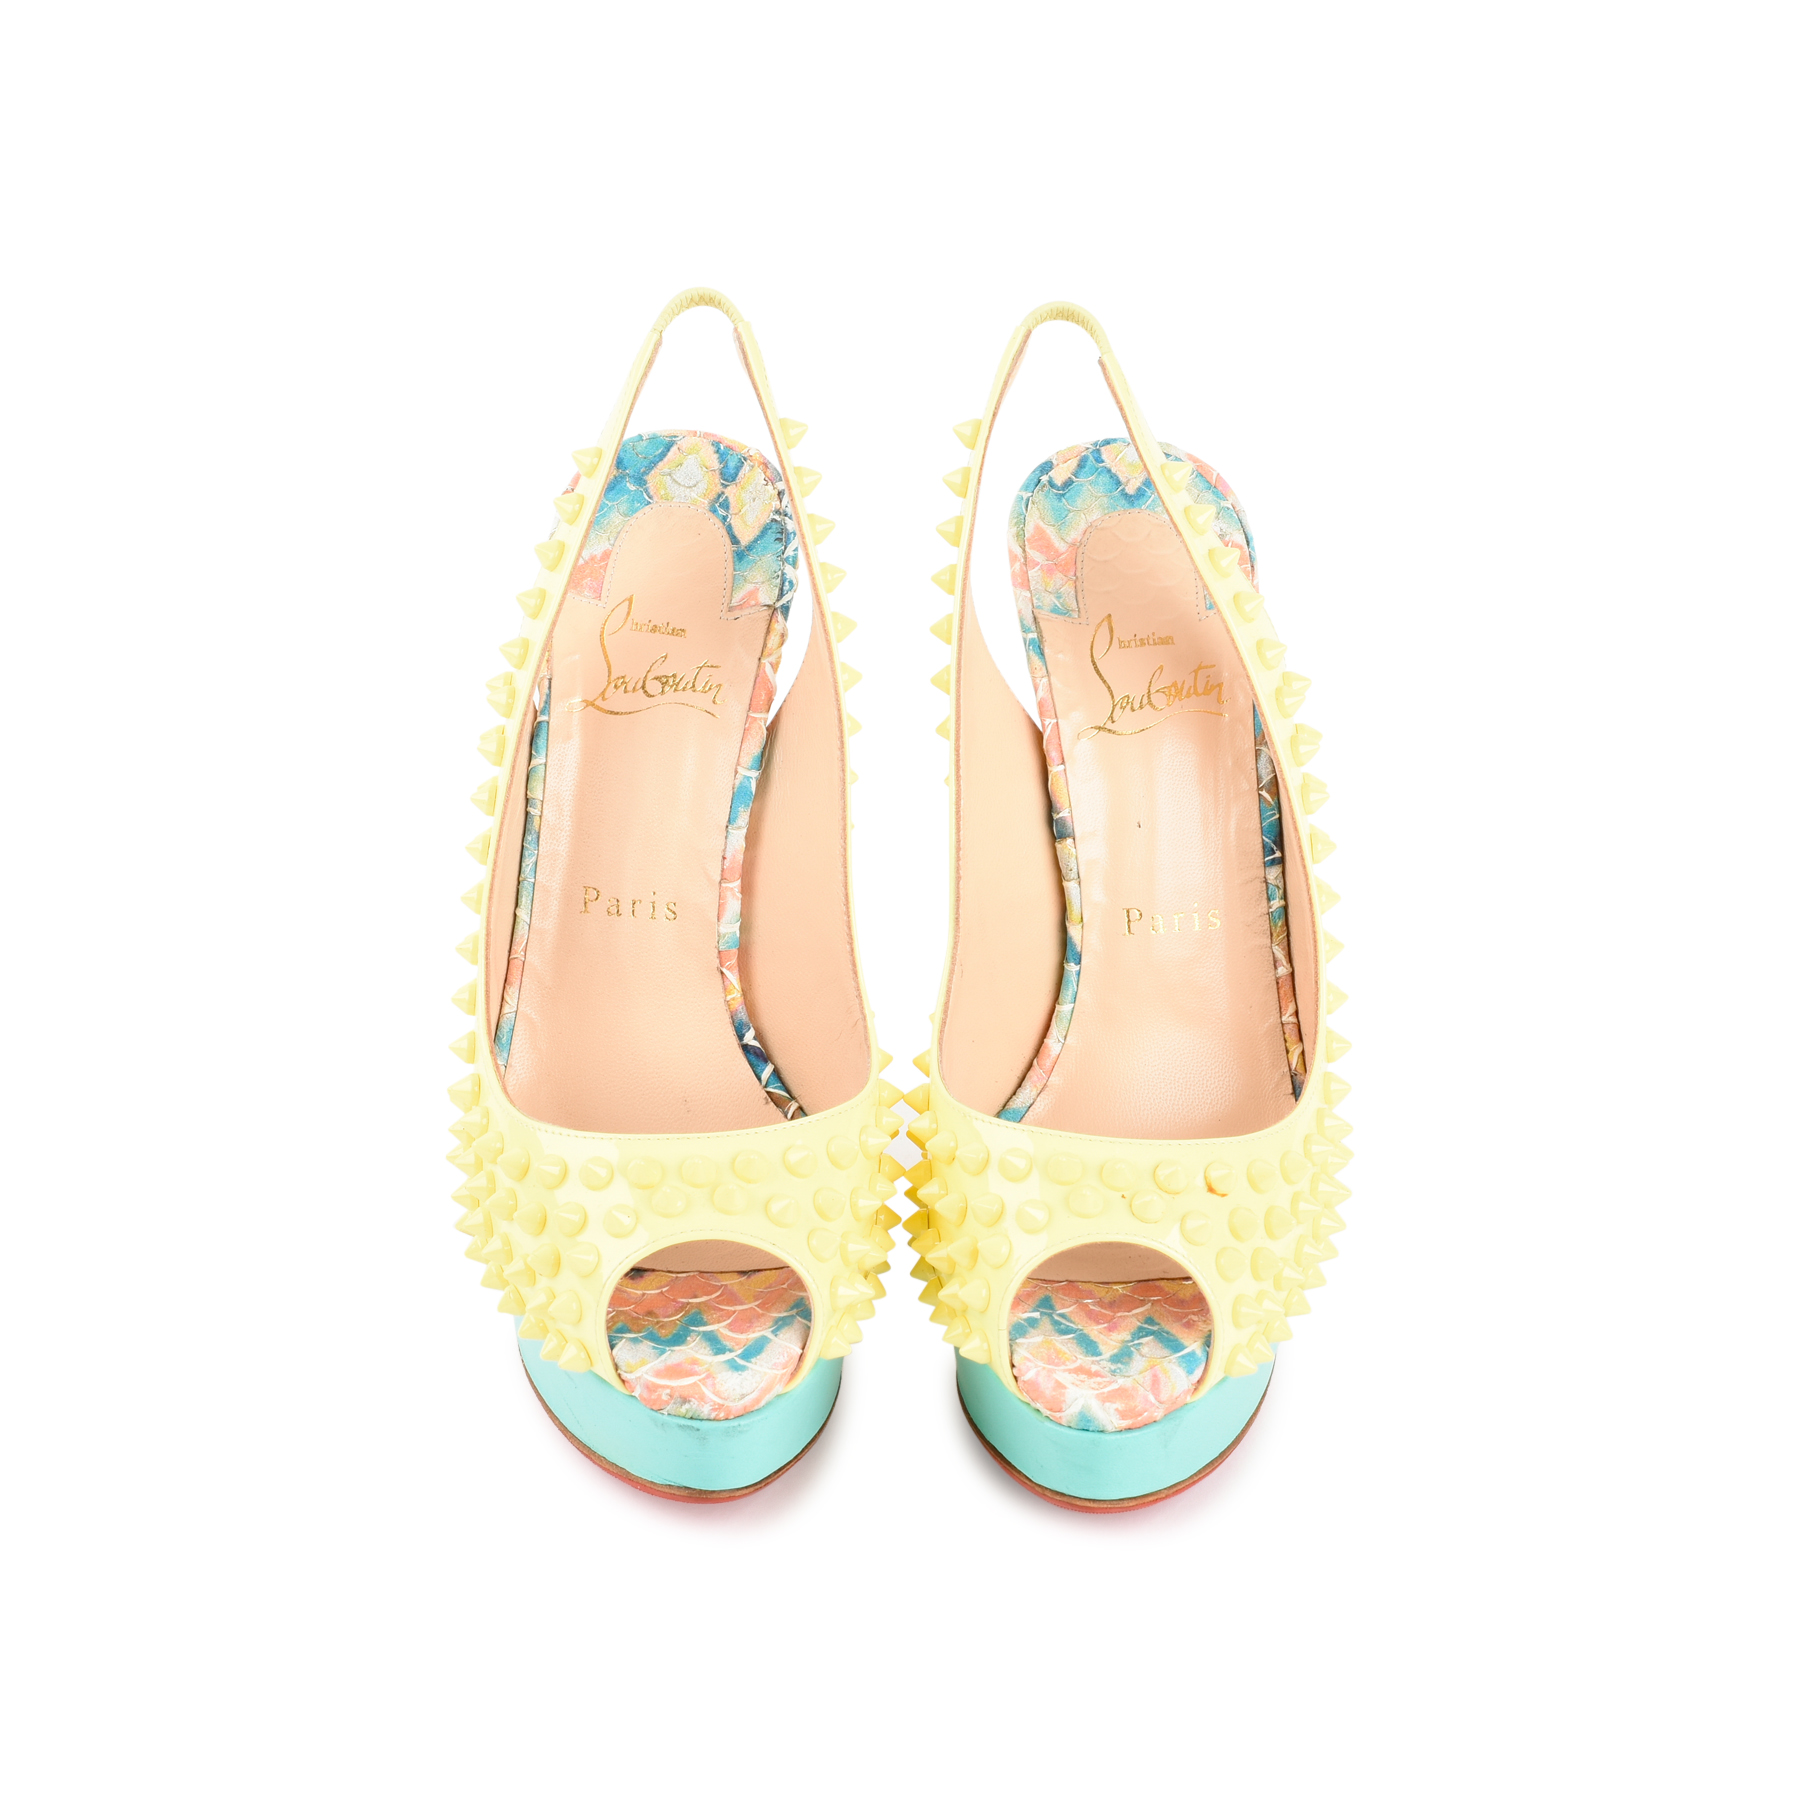 3a9ecca15f91 Authentic Second Hand Christian Louboutin Lady Peep Sling Spike Heels  (PSS-197-00069)